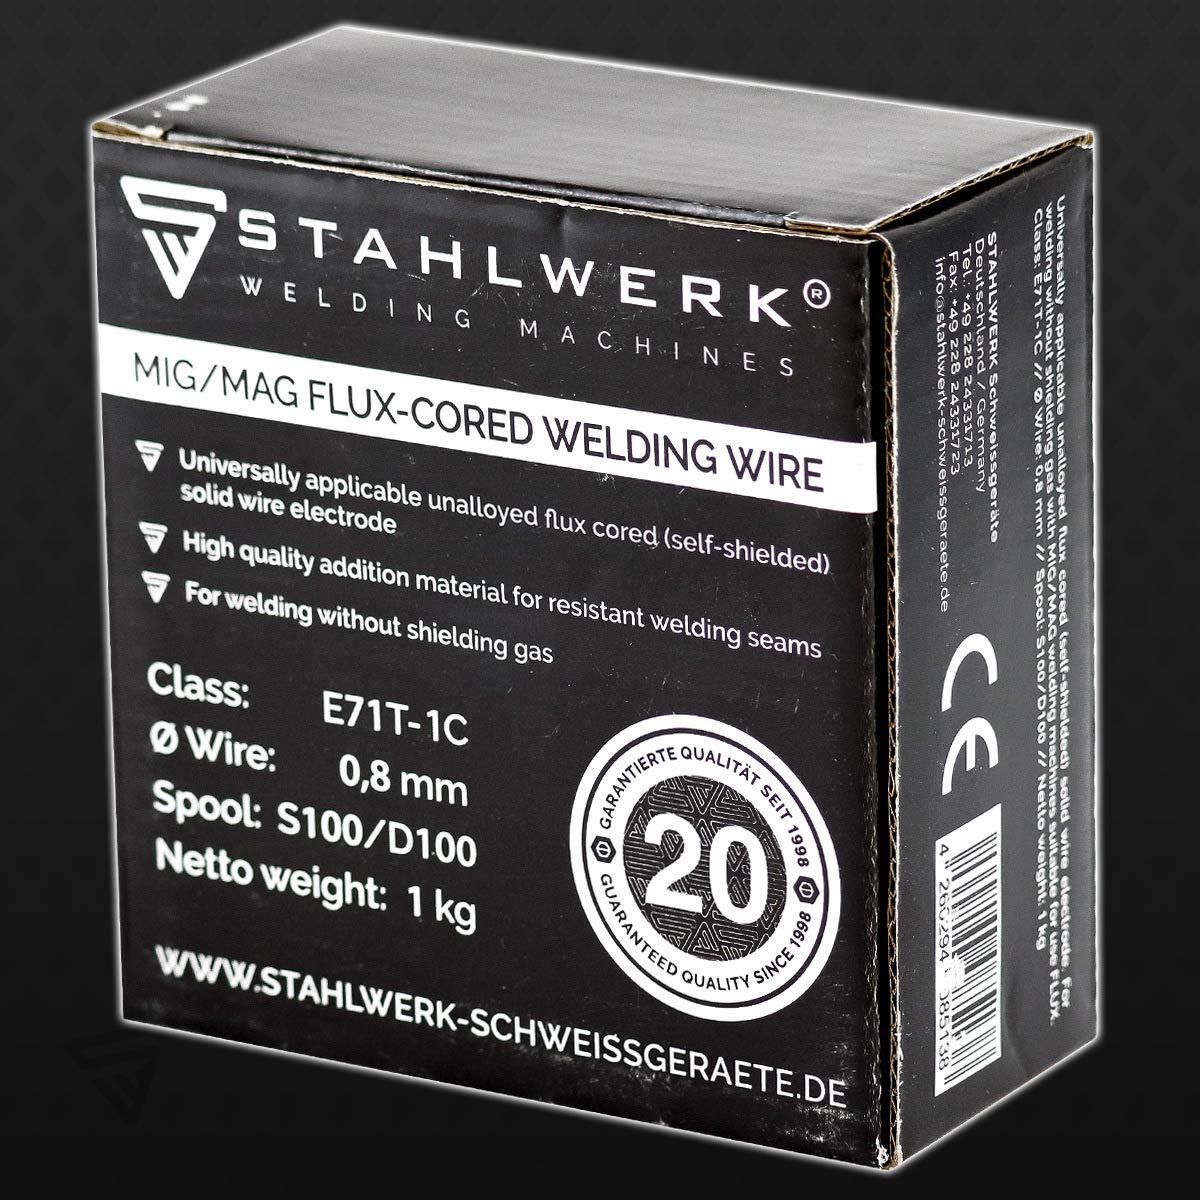 uso universal en rollo de 1 kg D100 con mandril de 16 mm Alambre de acero MIG//MAG juego de 3 unidades di/ámetro de 0,8 mm alambre de soldadura Flux E71T-1C